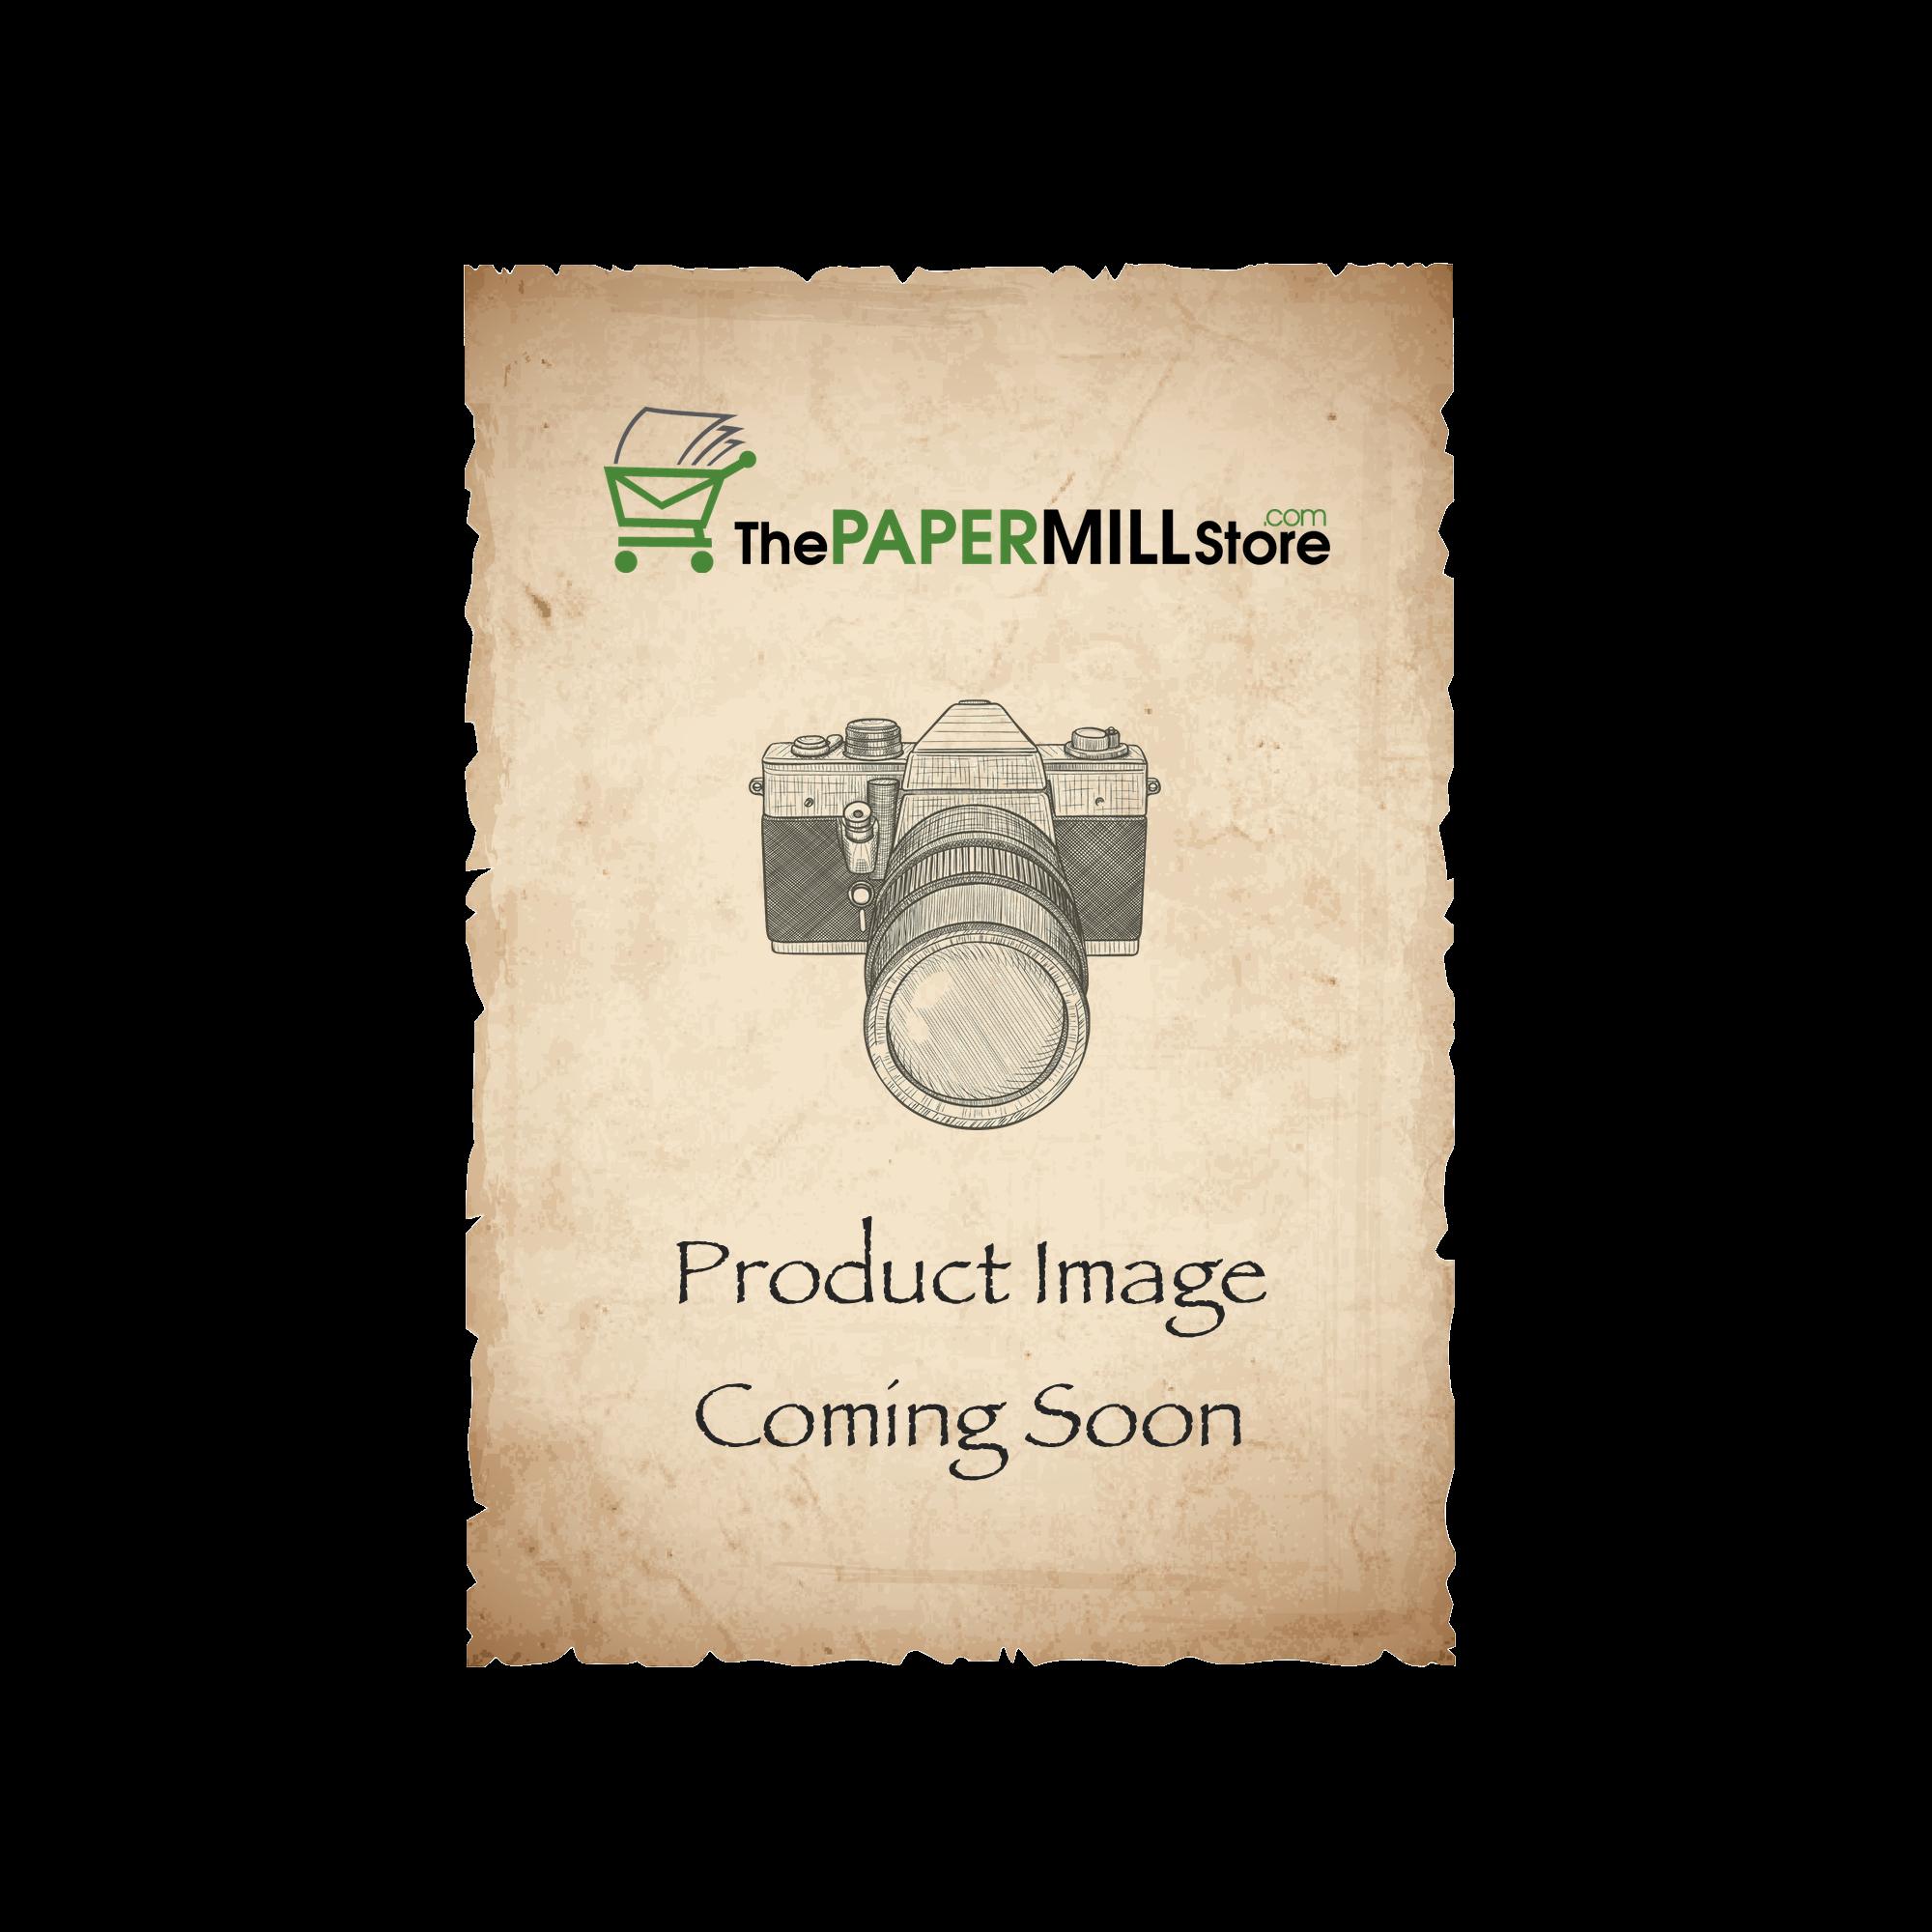 Splendorlux Kiwi Paper - 8 1/2 x 11 in 11.5 pt Cover Laser C/1S 250 per Package